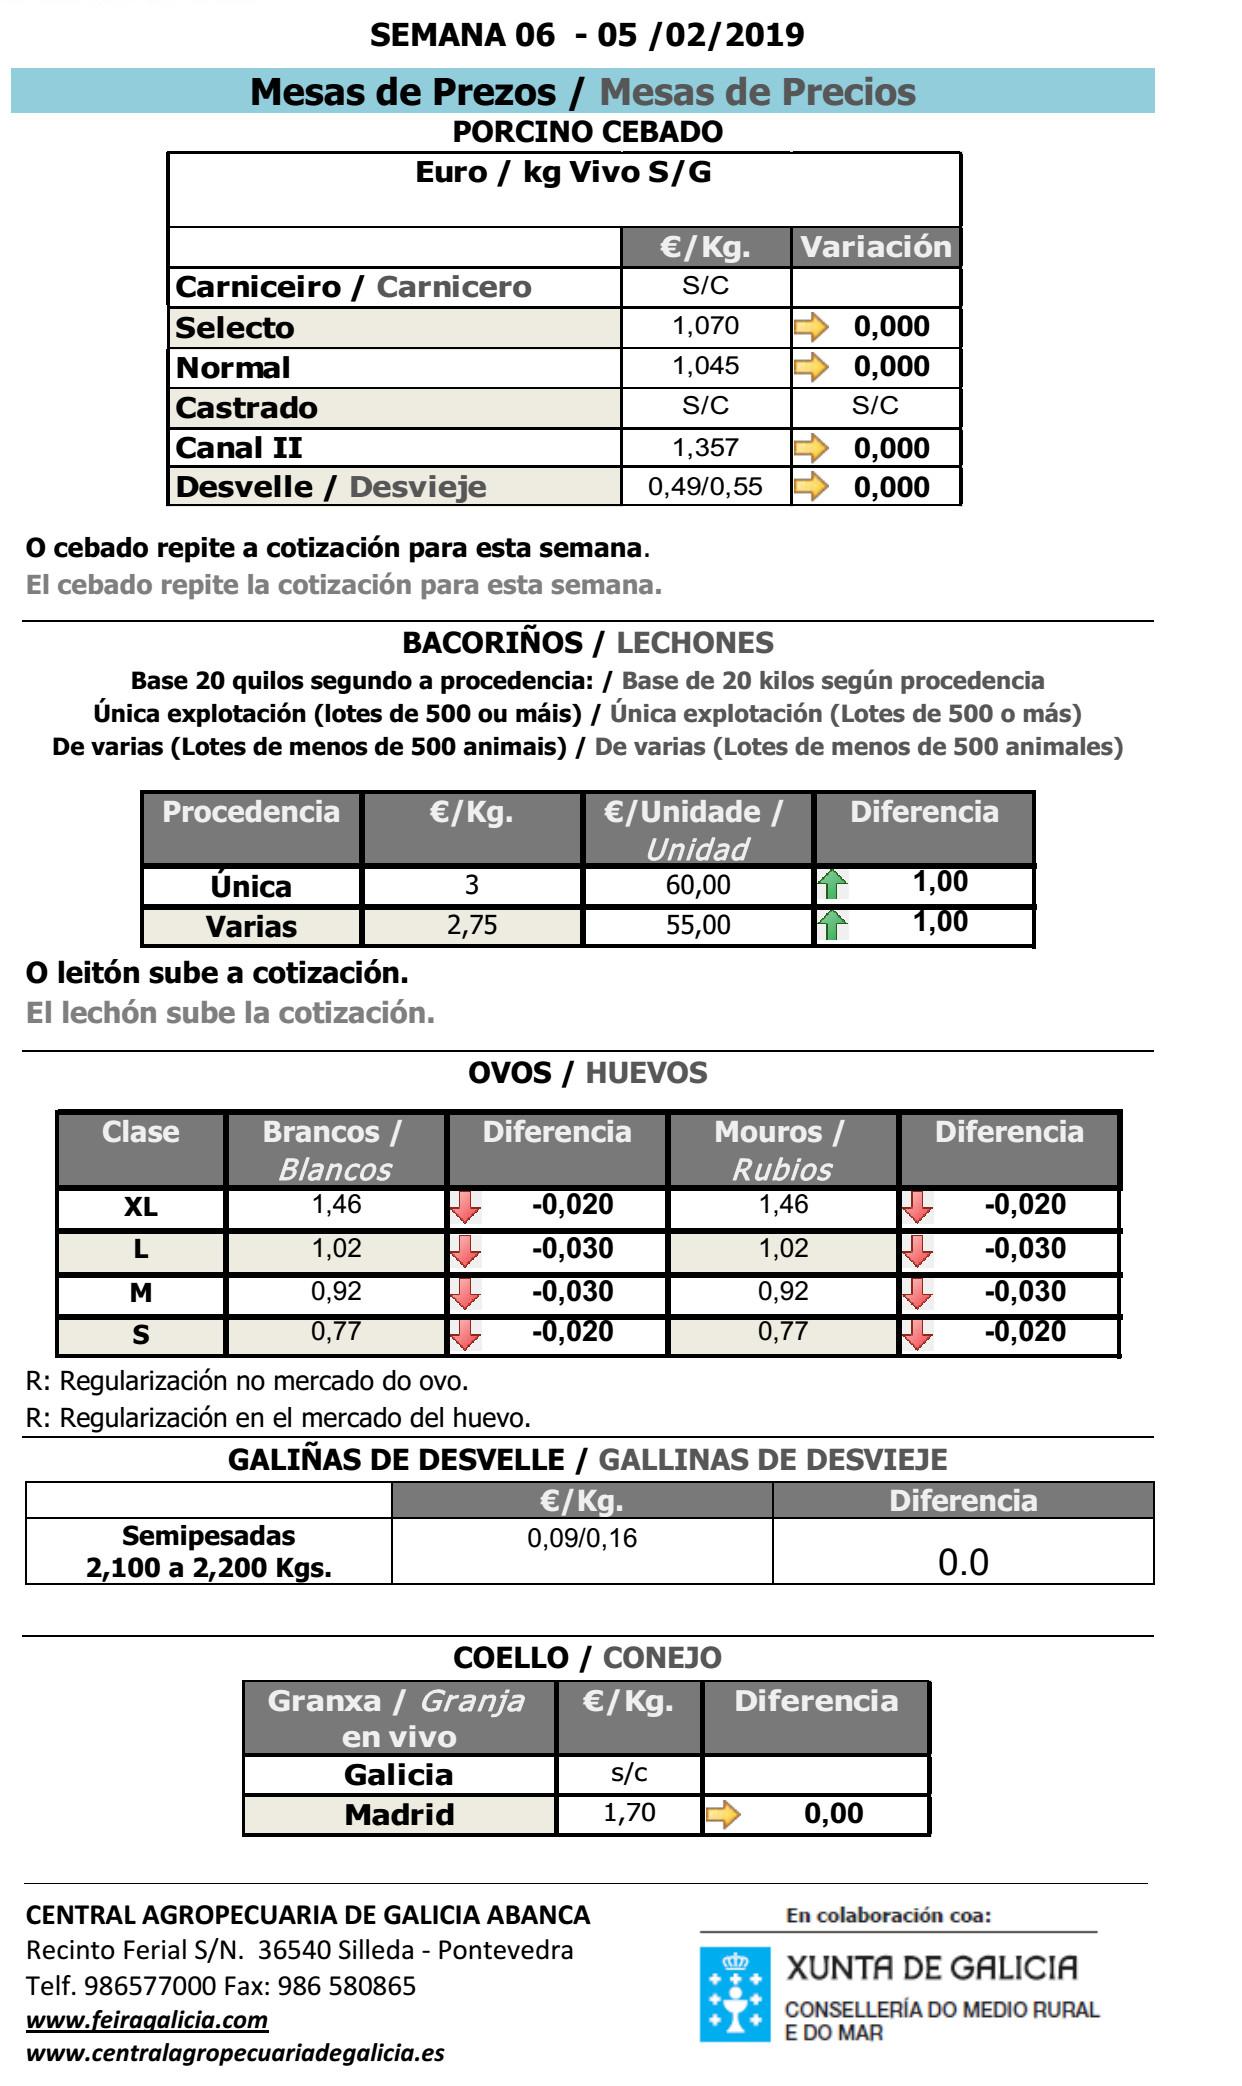 SILLEDA_19_2_1_PORCINO